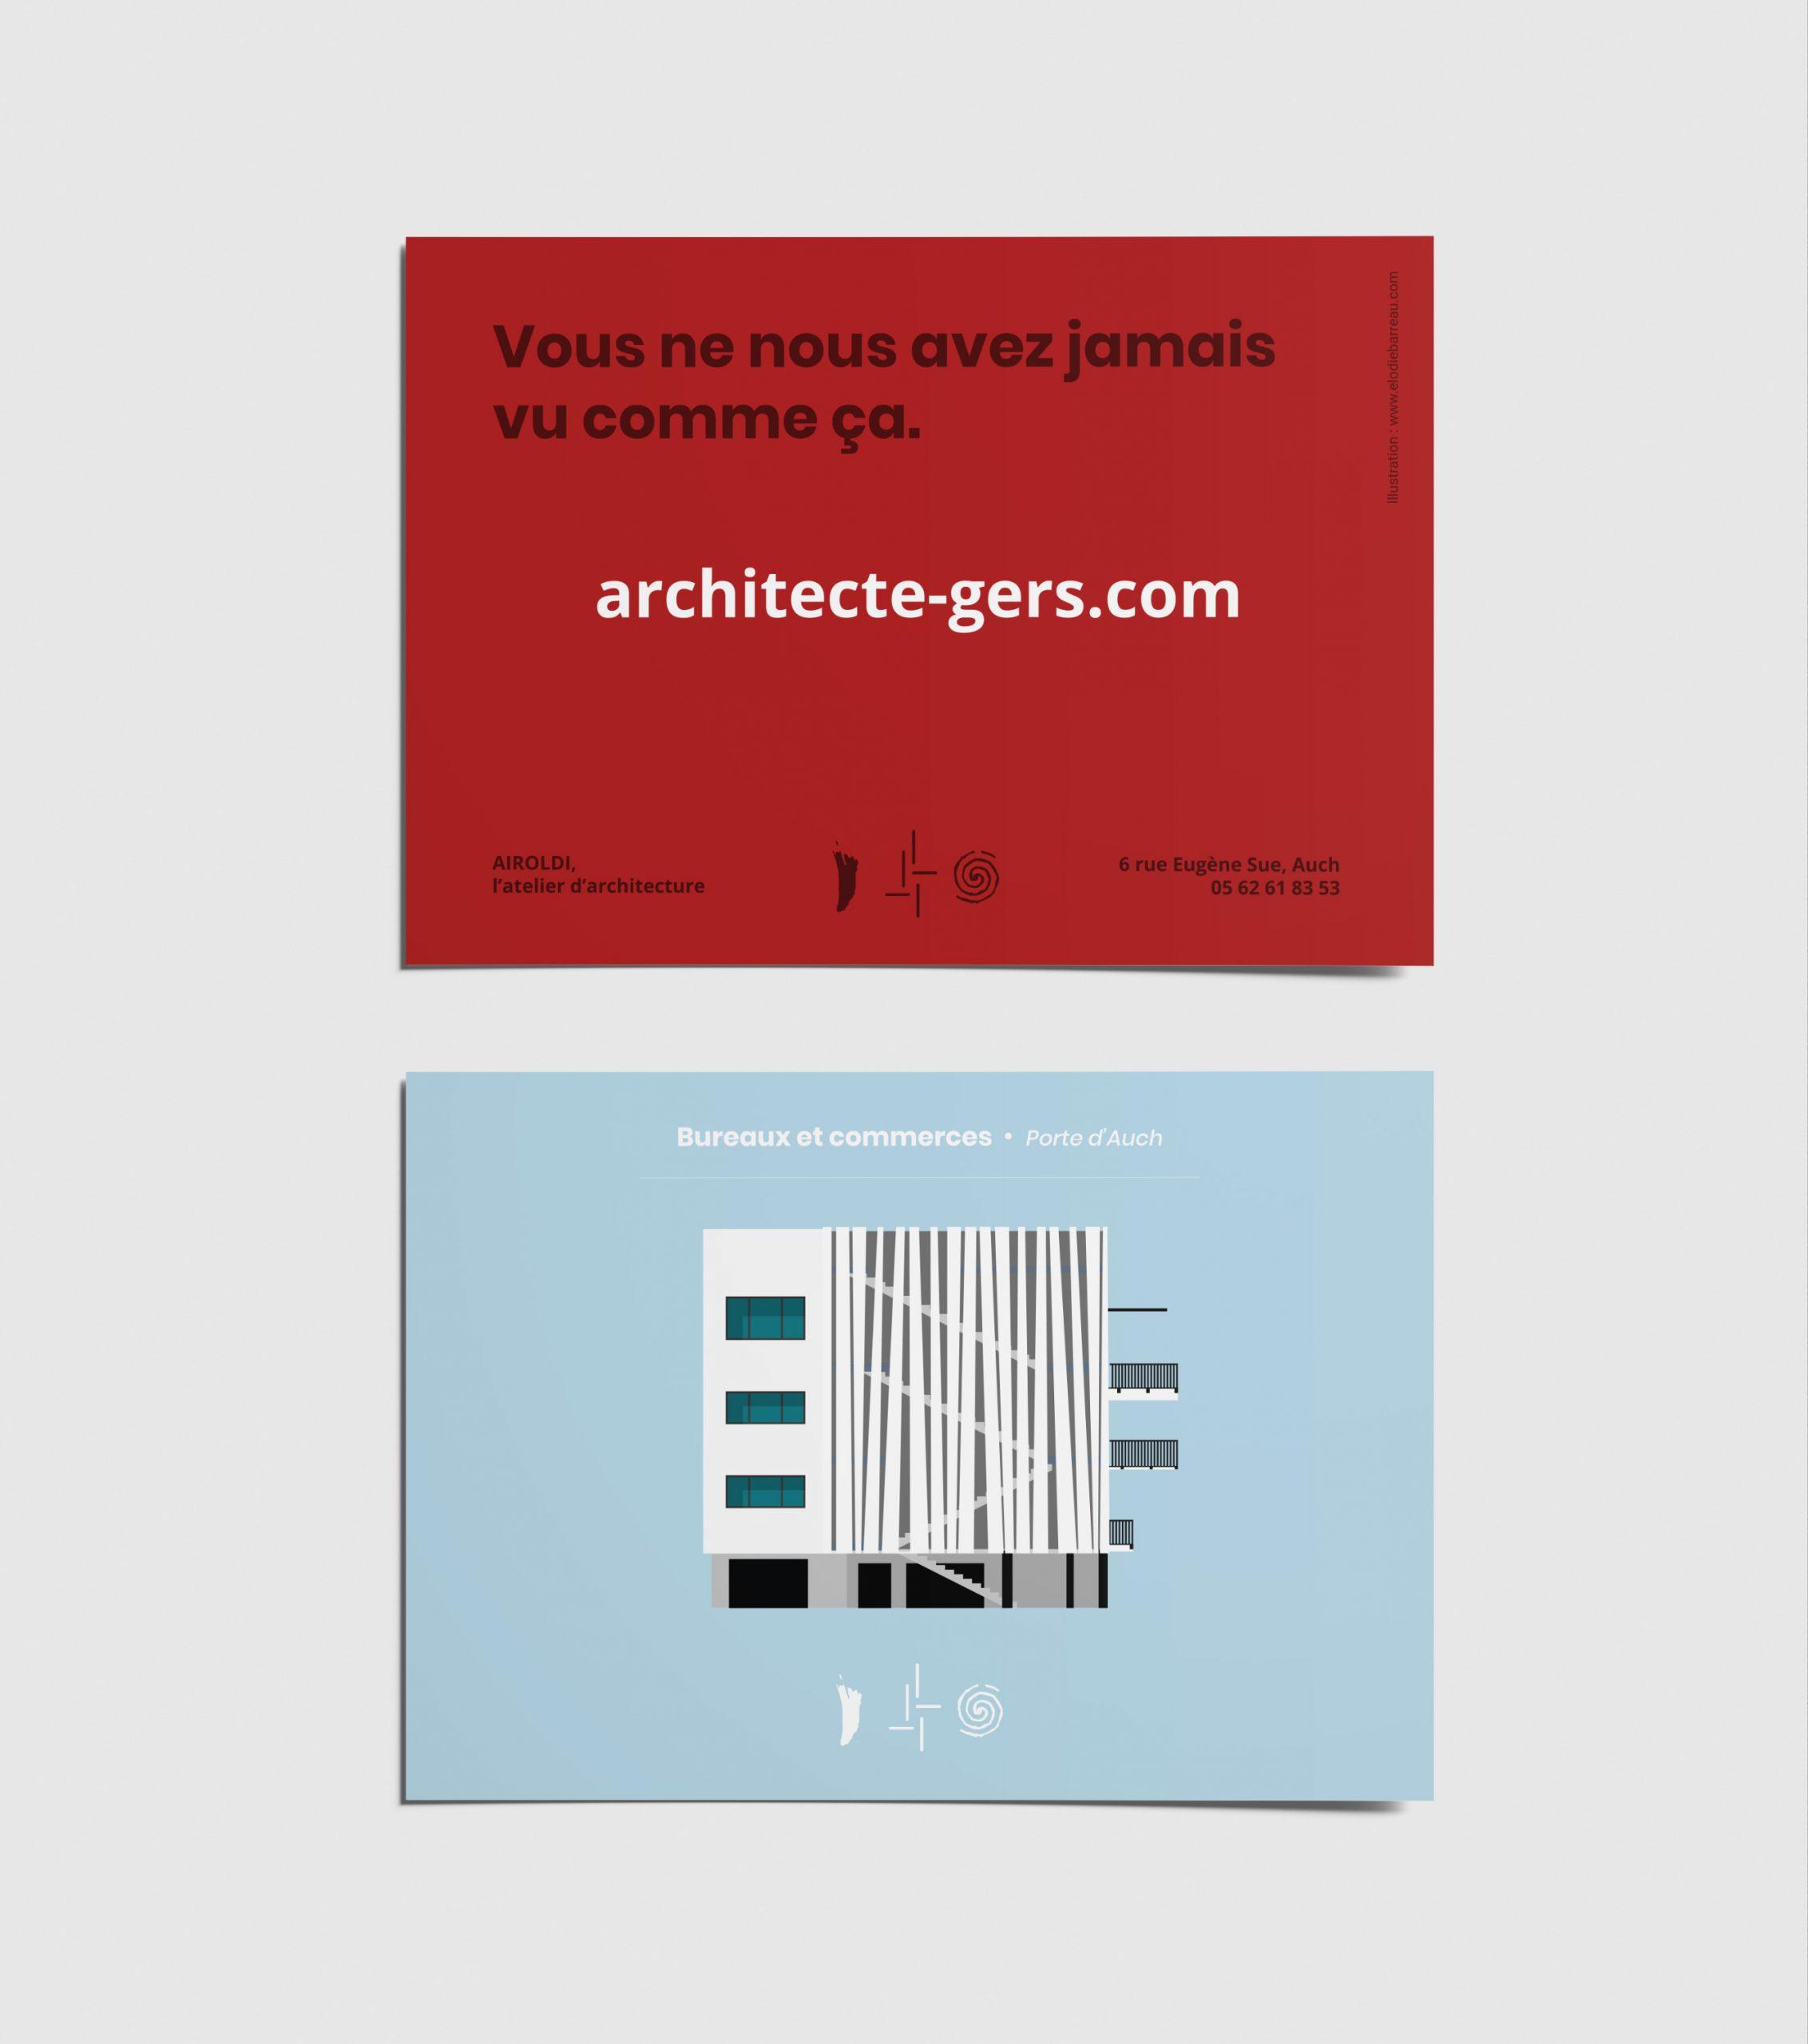 cartes postales airoldi architecte architecture gers illustration